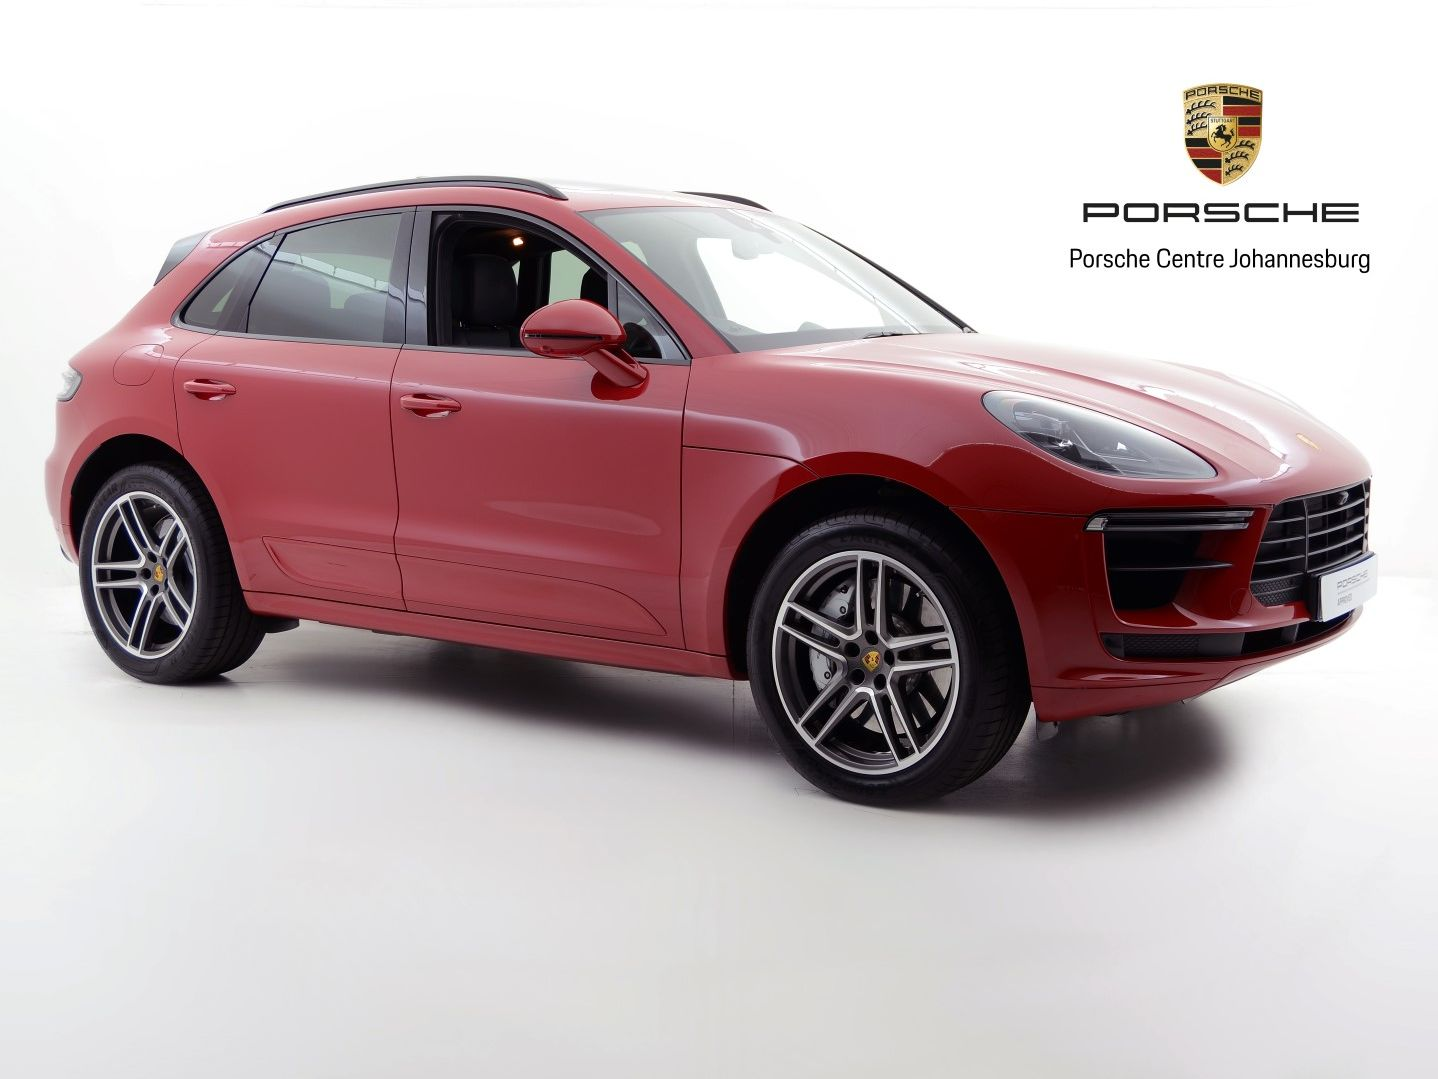 2020 Porsche Macan Turbo – 1